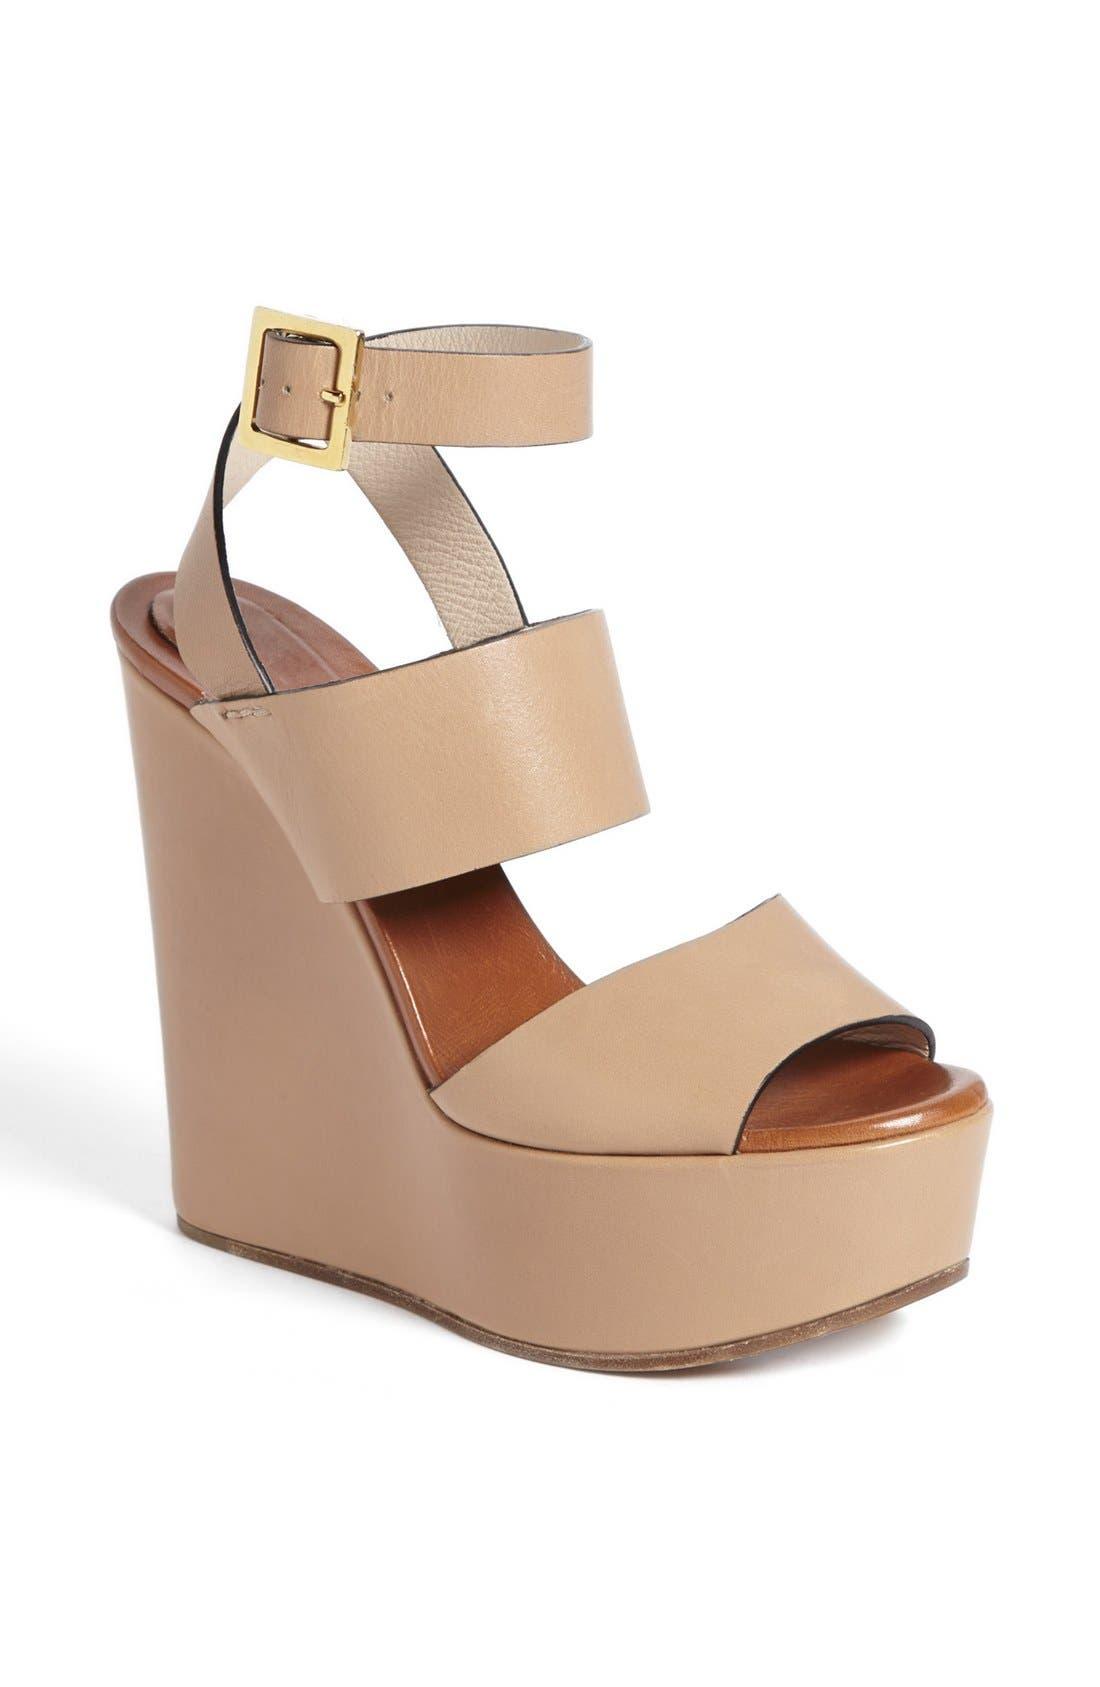 Main Image - Chloé 'Central' Wedge Sandal